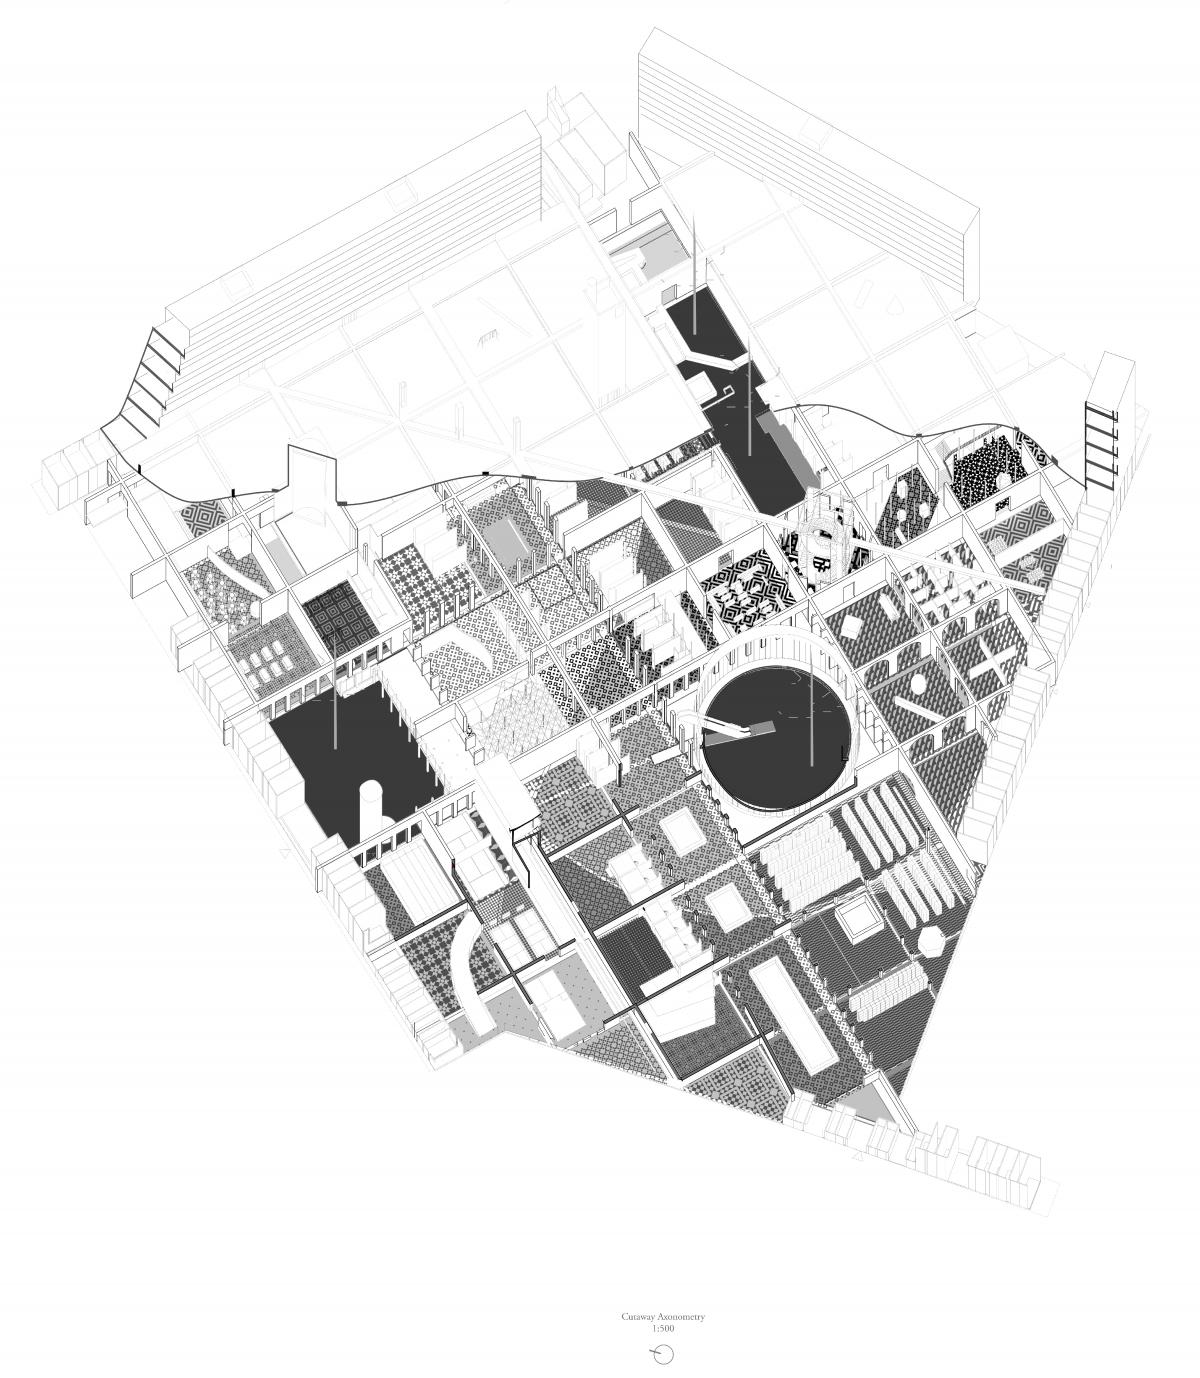 The-Ruin-and-the-Mall_Tadeas-Riha_1.jpg